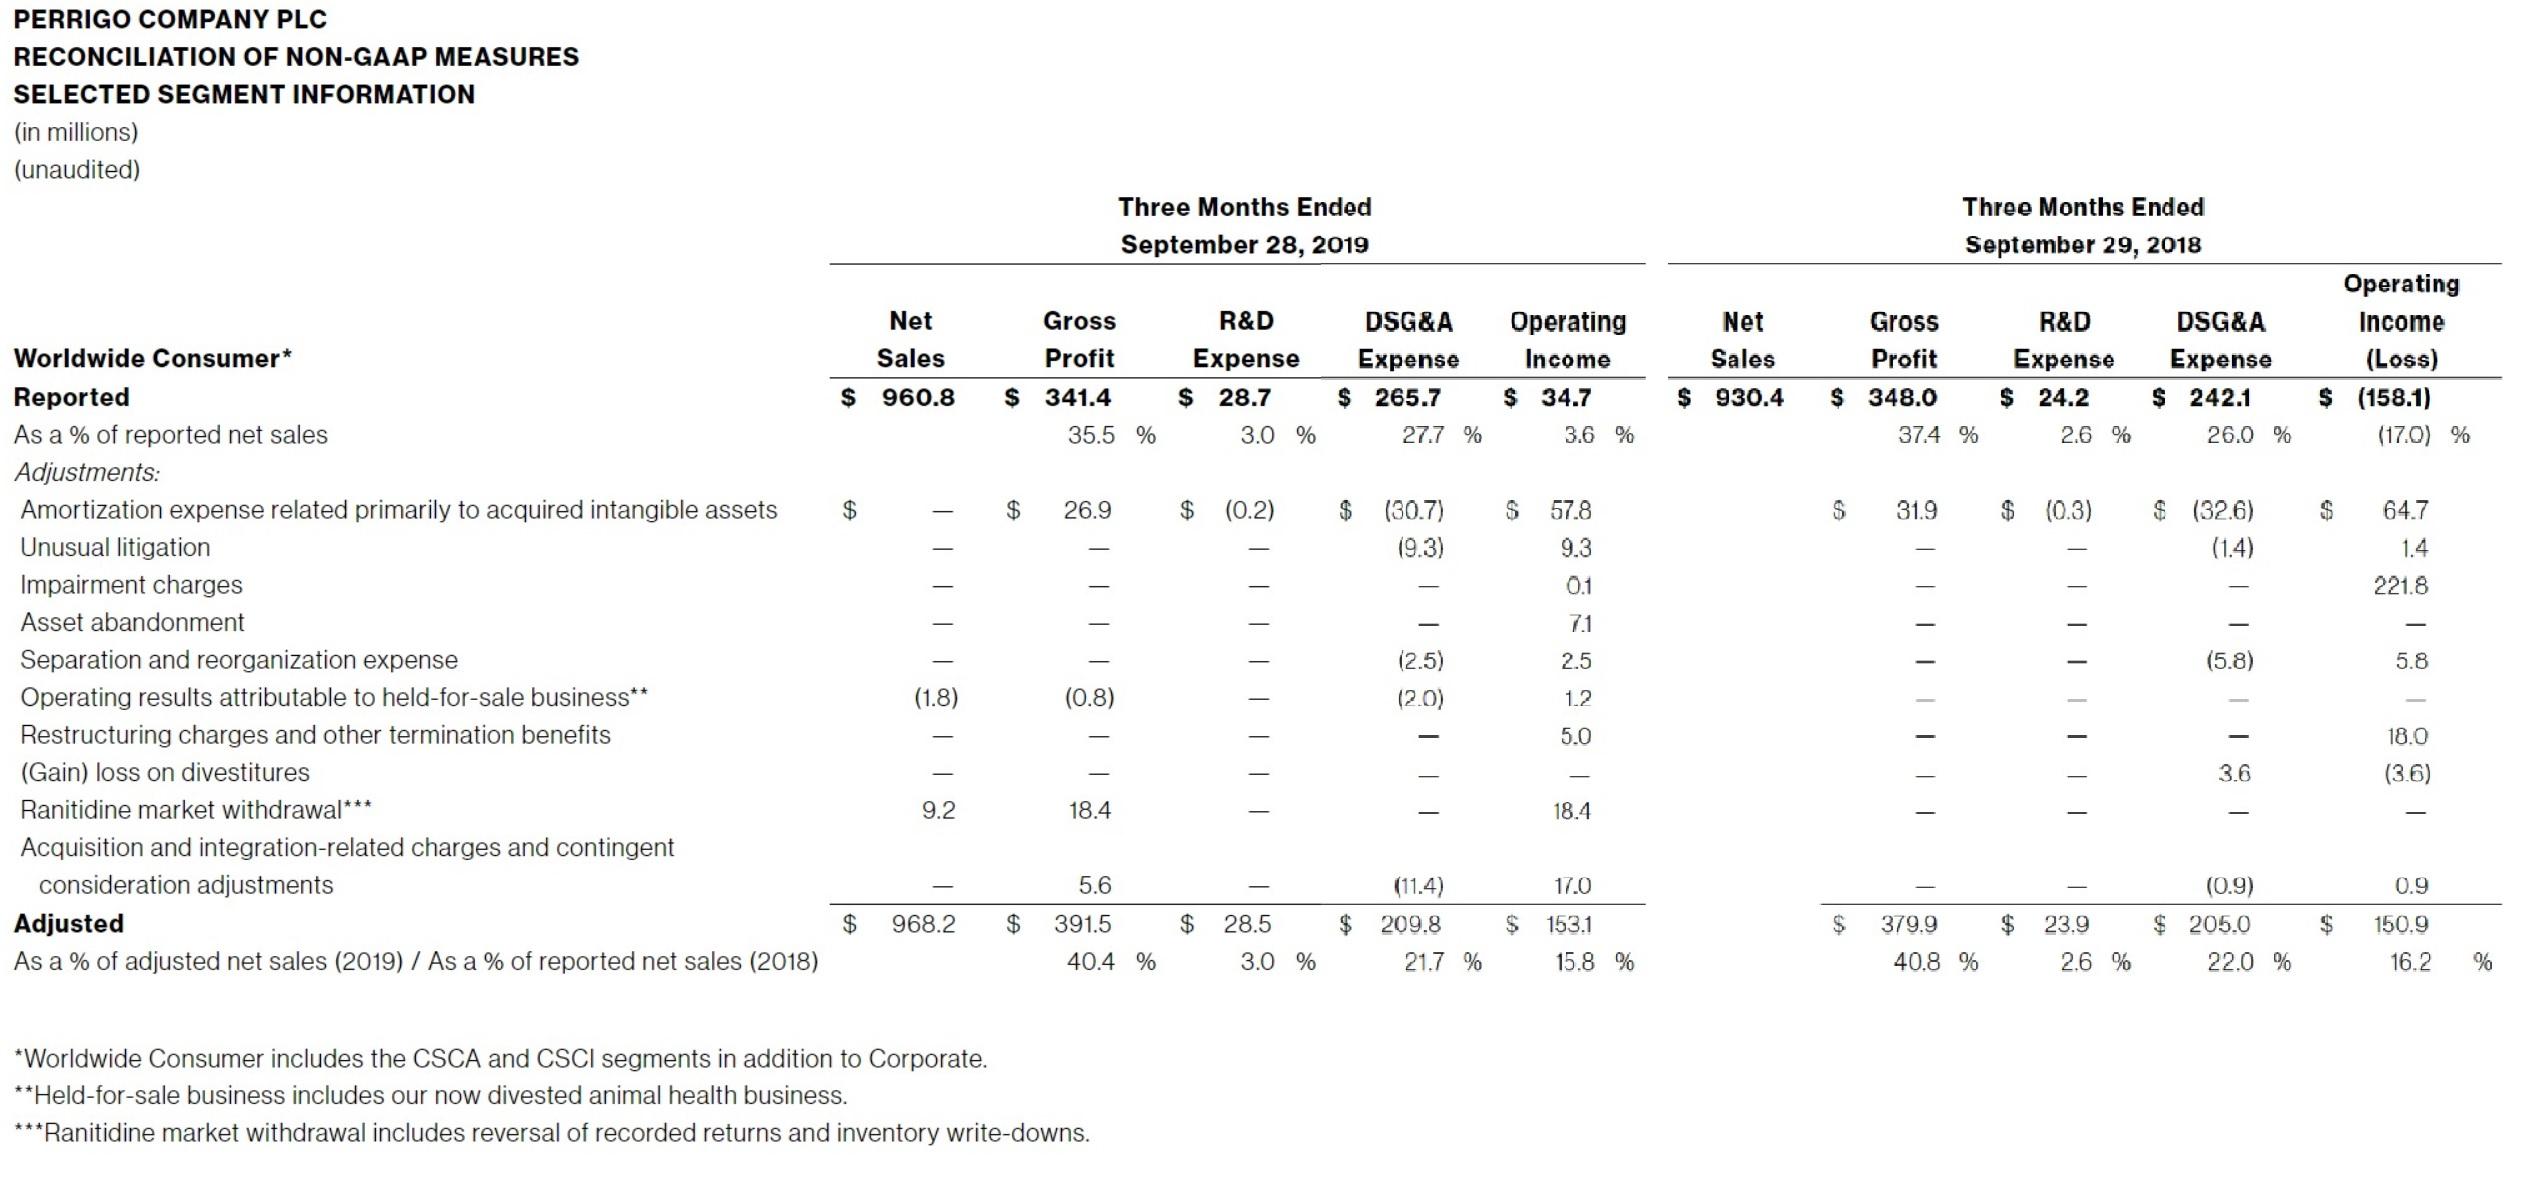 TABLE-II-PERRIGO-COMPANY-PLC-RECONCILIATION-OF-NON-GAAP-MEASURES-SELECTED-SEGMENT-INFORMATION